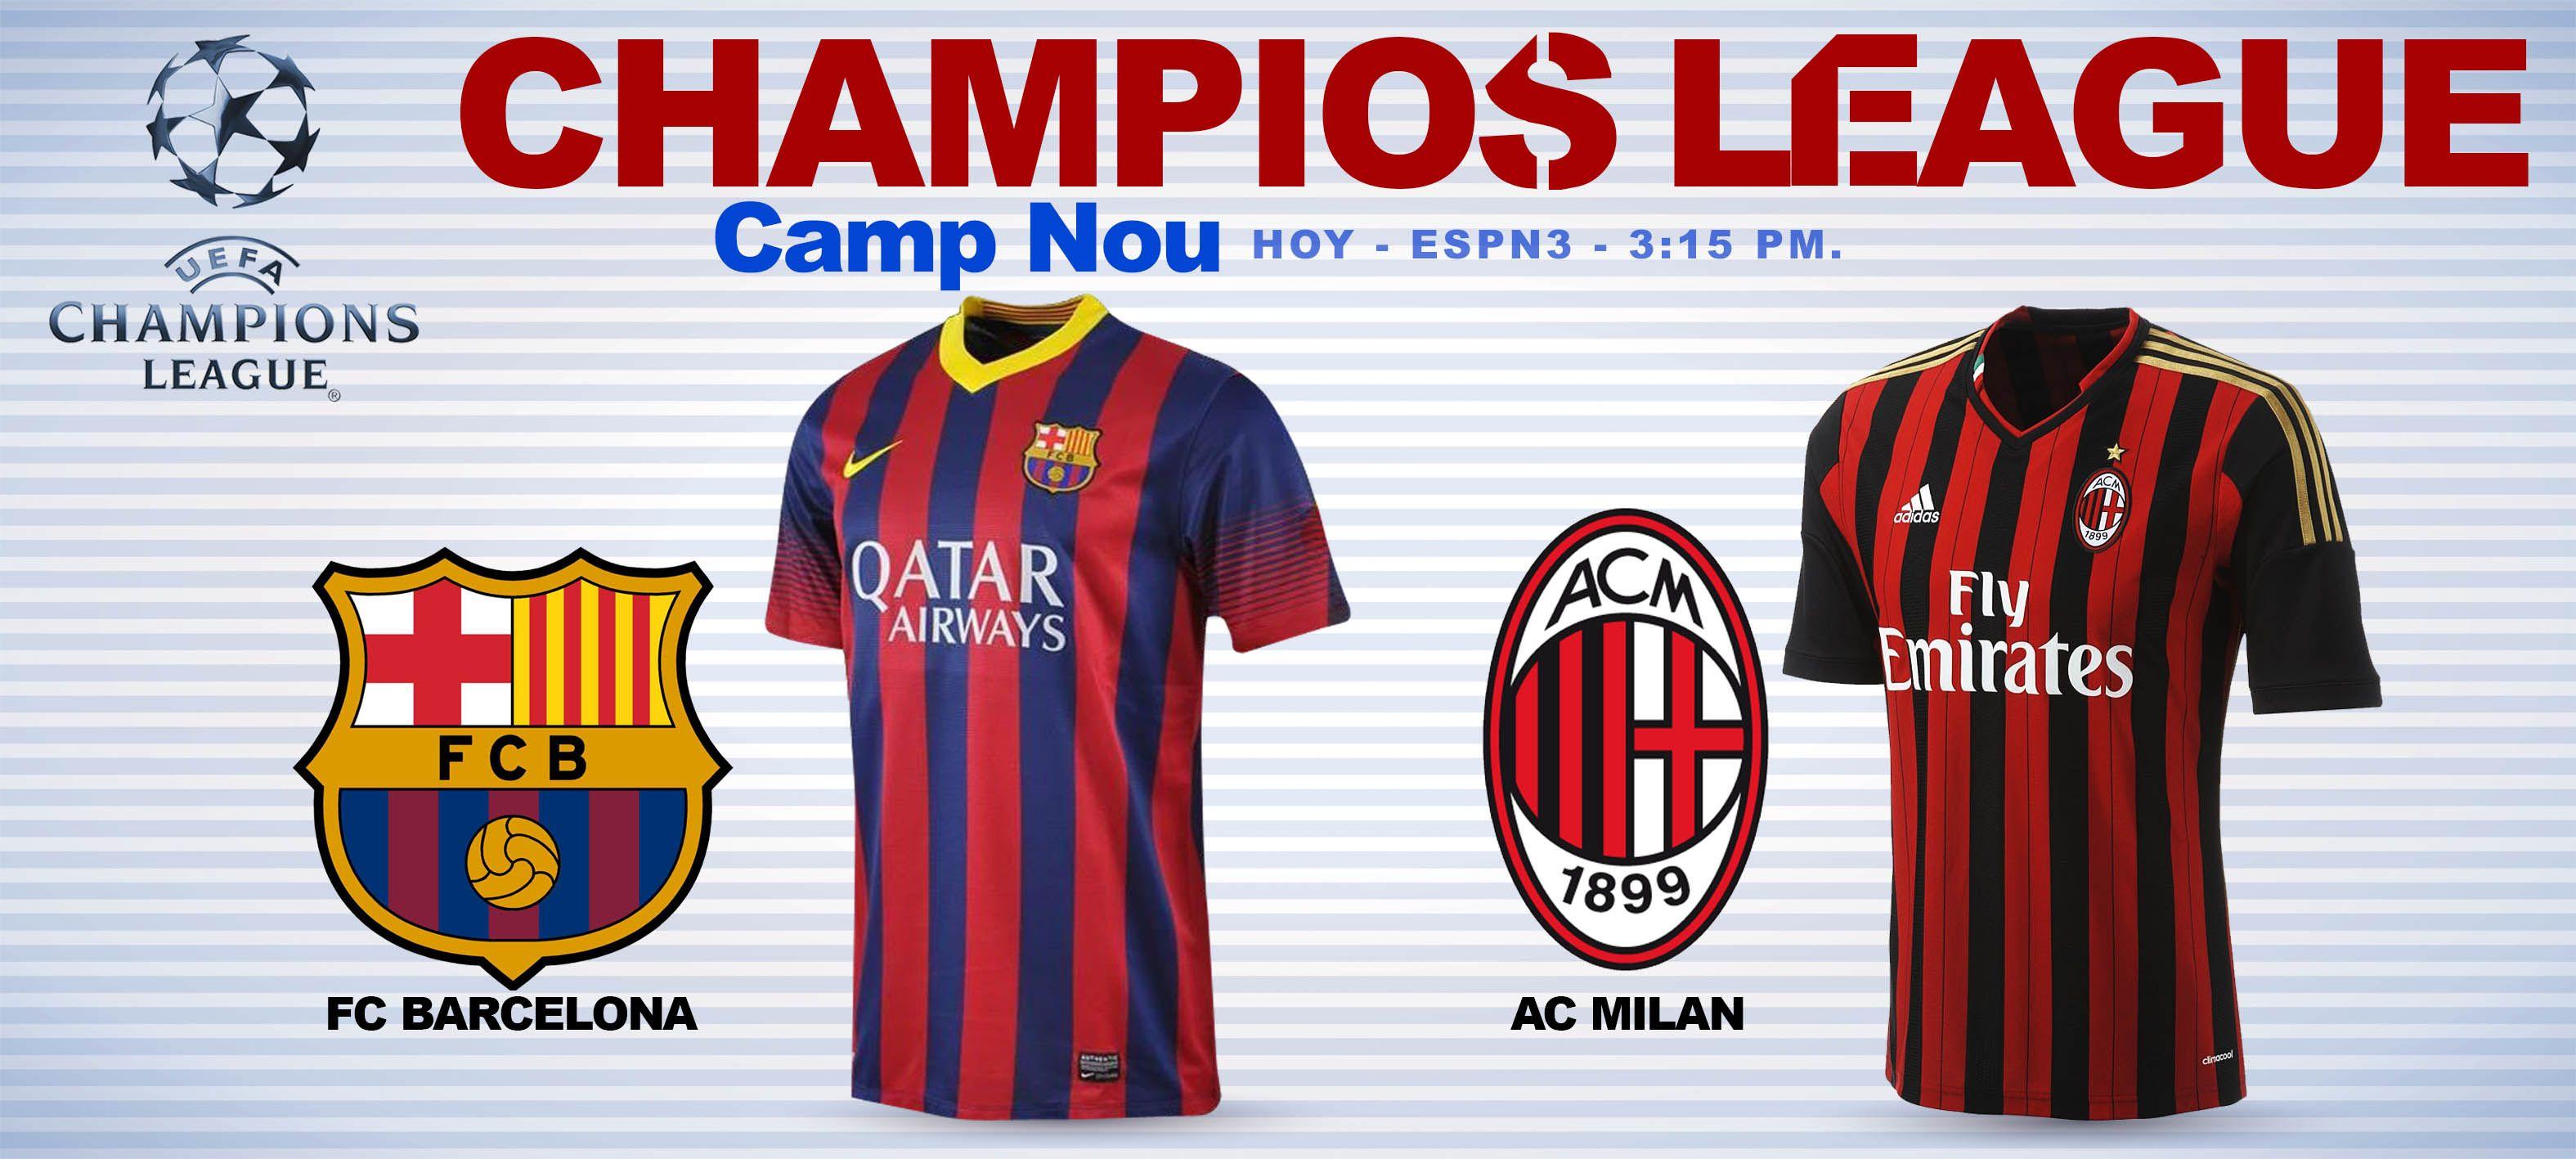 UEFAChampionsLeague FCBarcelona ACMilan Camp Nou